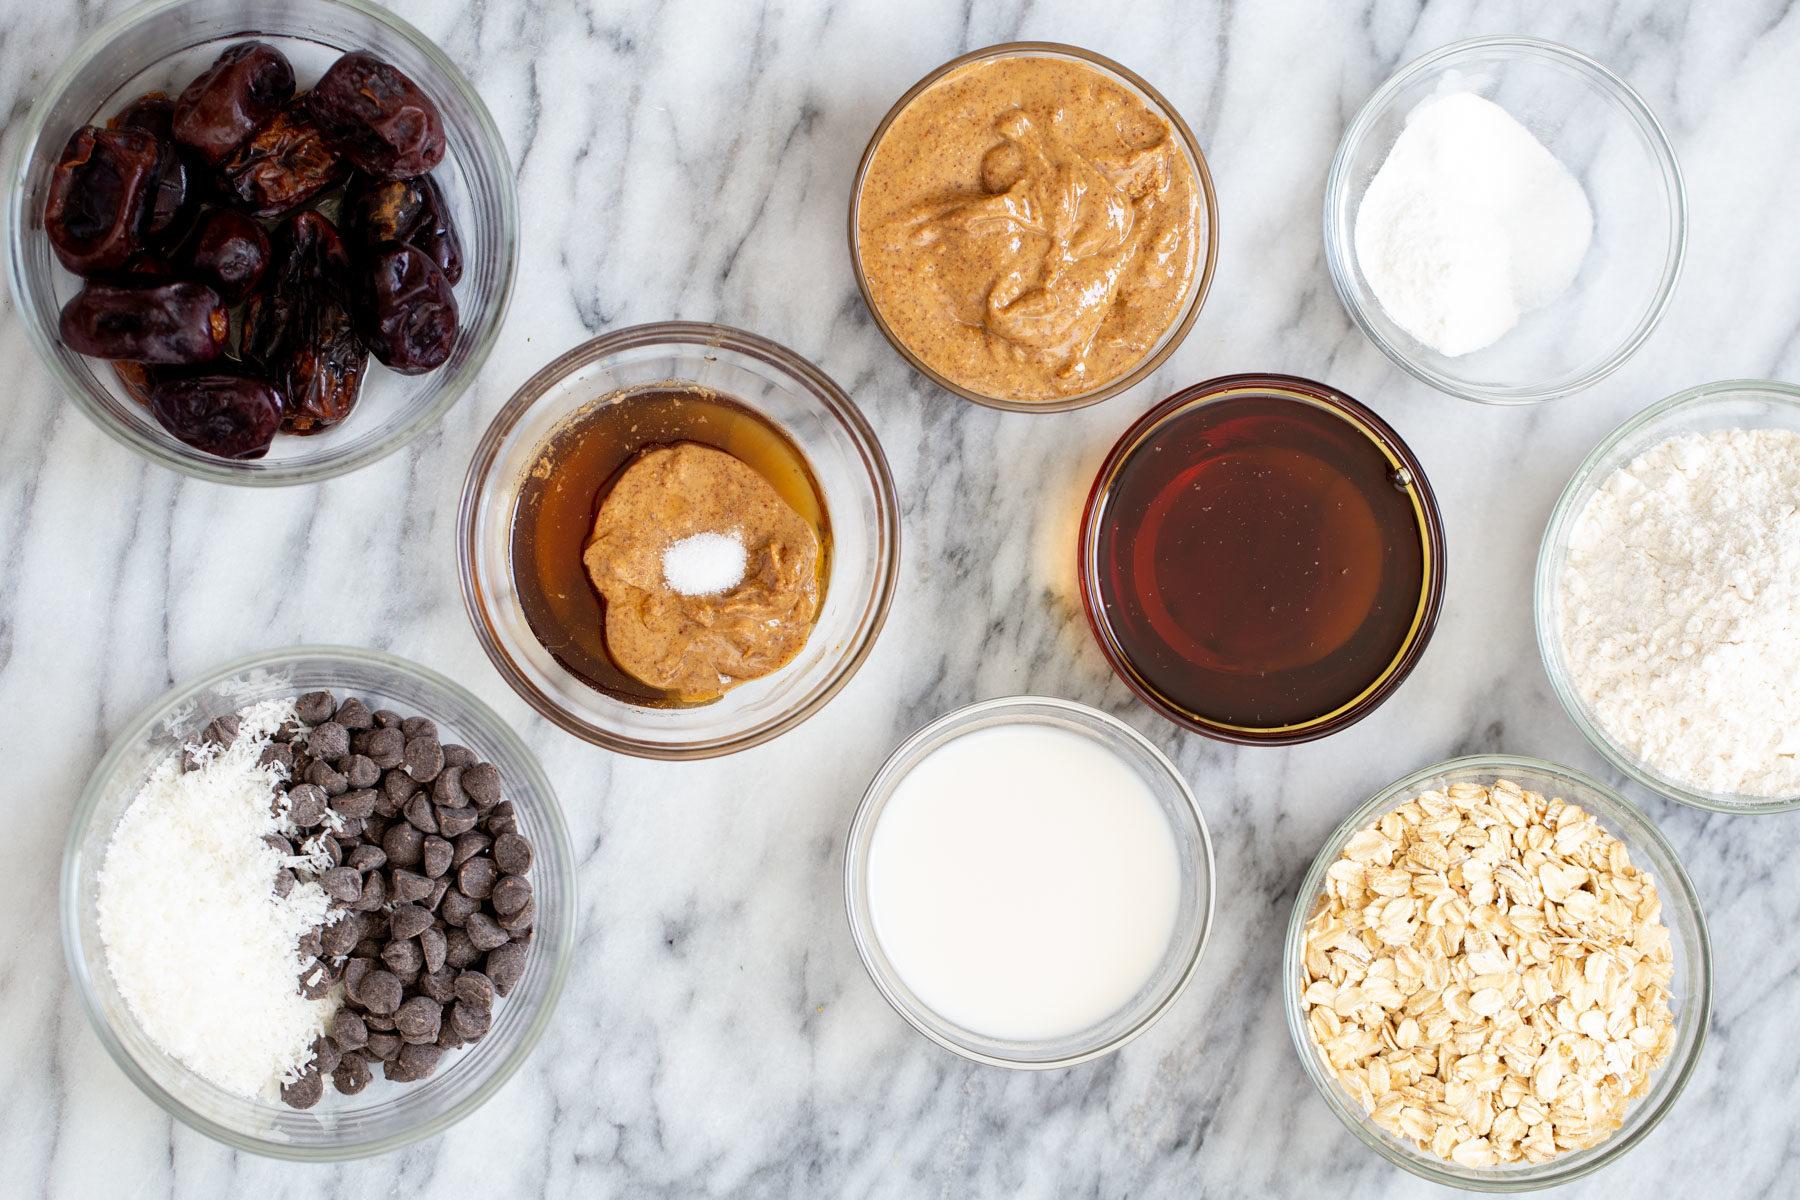 ingredients needed for making vegan date caramel oatmeal bars